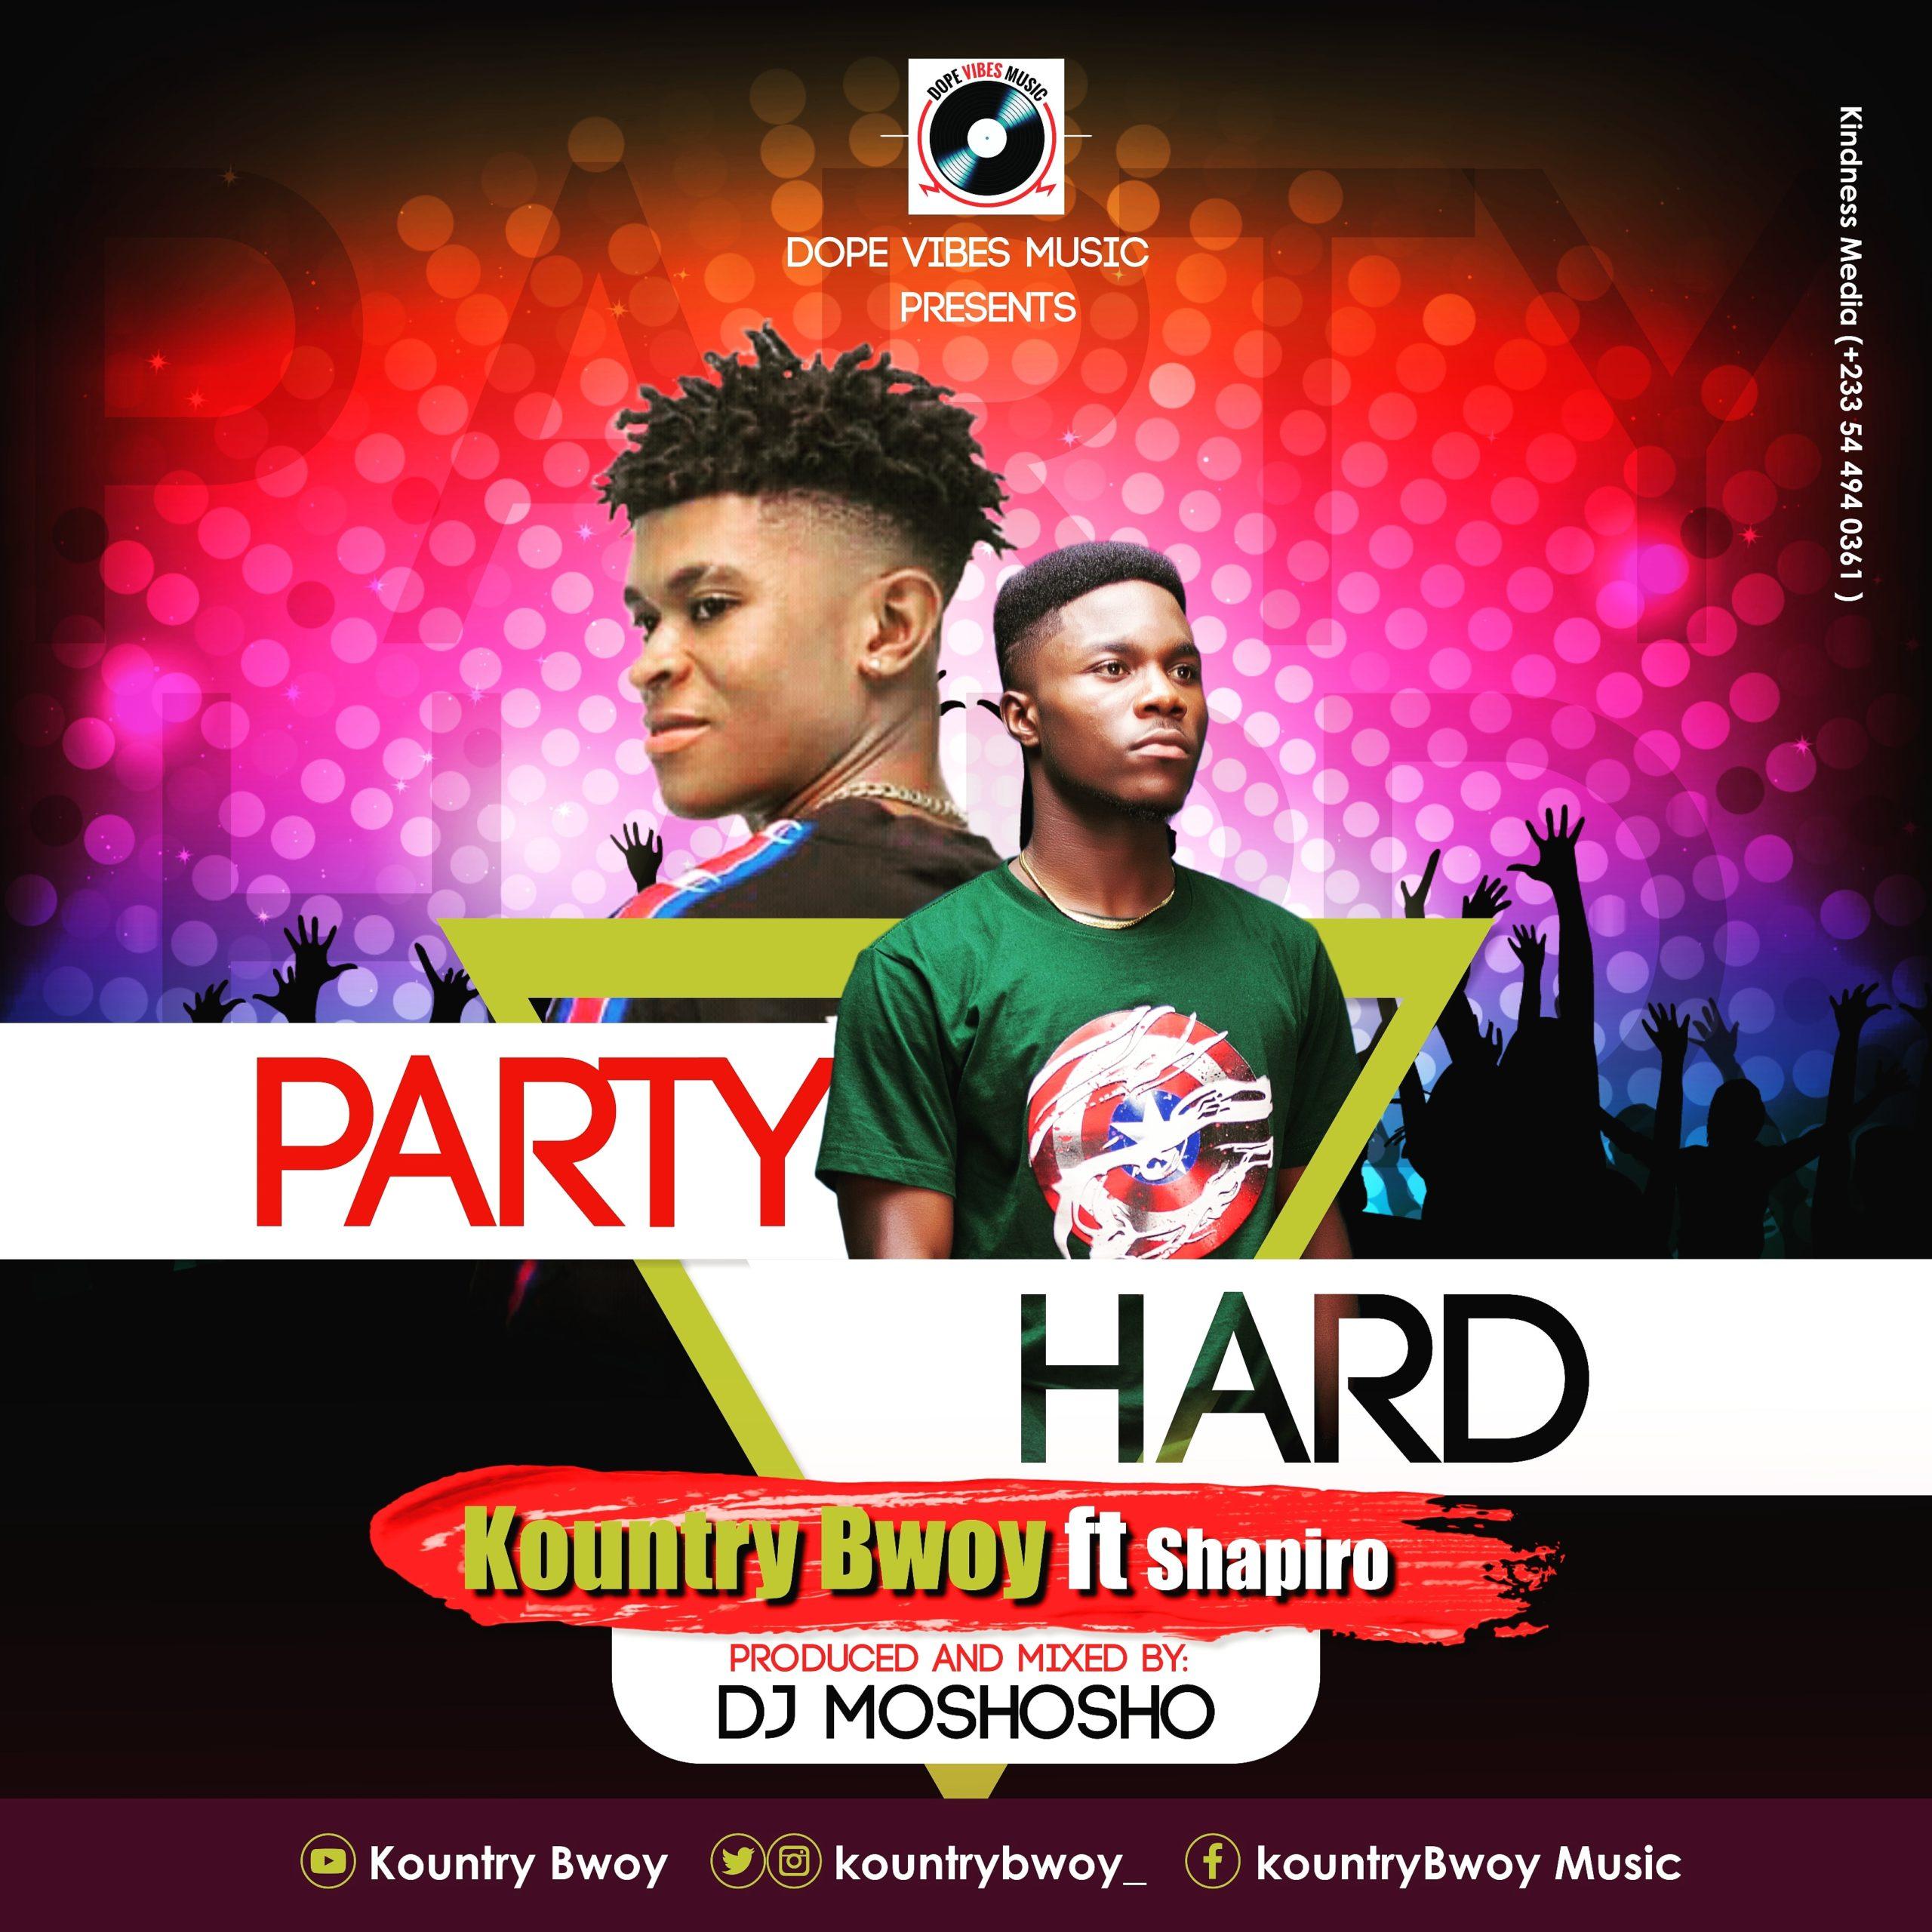 Kountry Bwoy – Party Hard Ft Shapiro (Prod By DJ Moshoho)